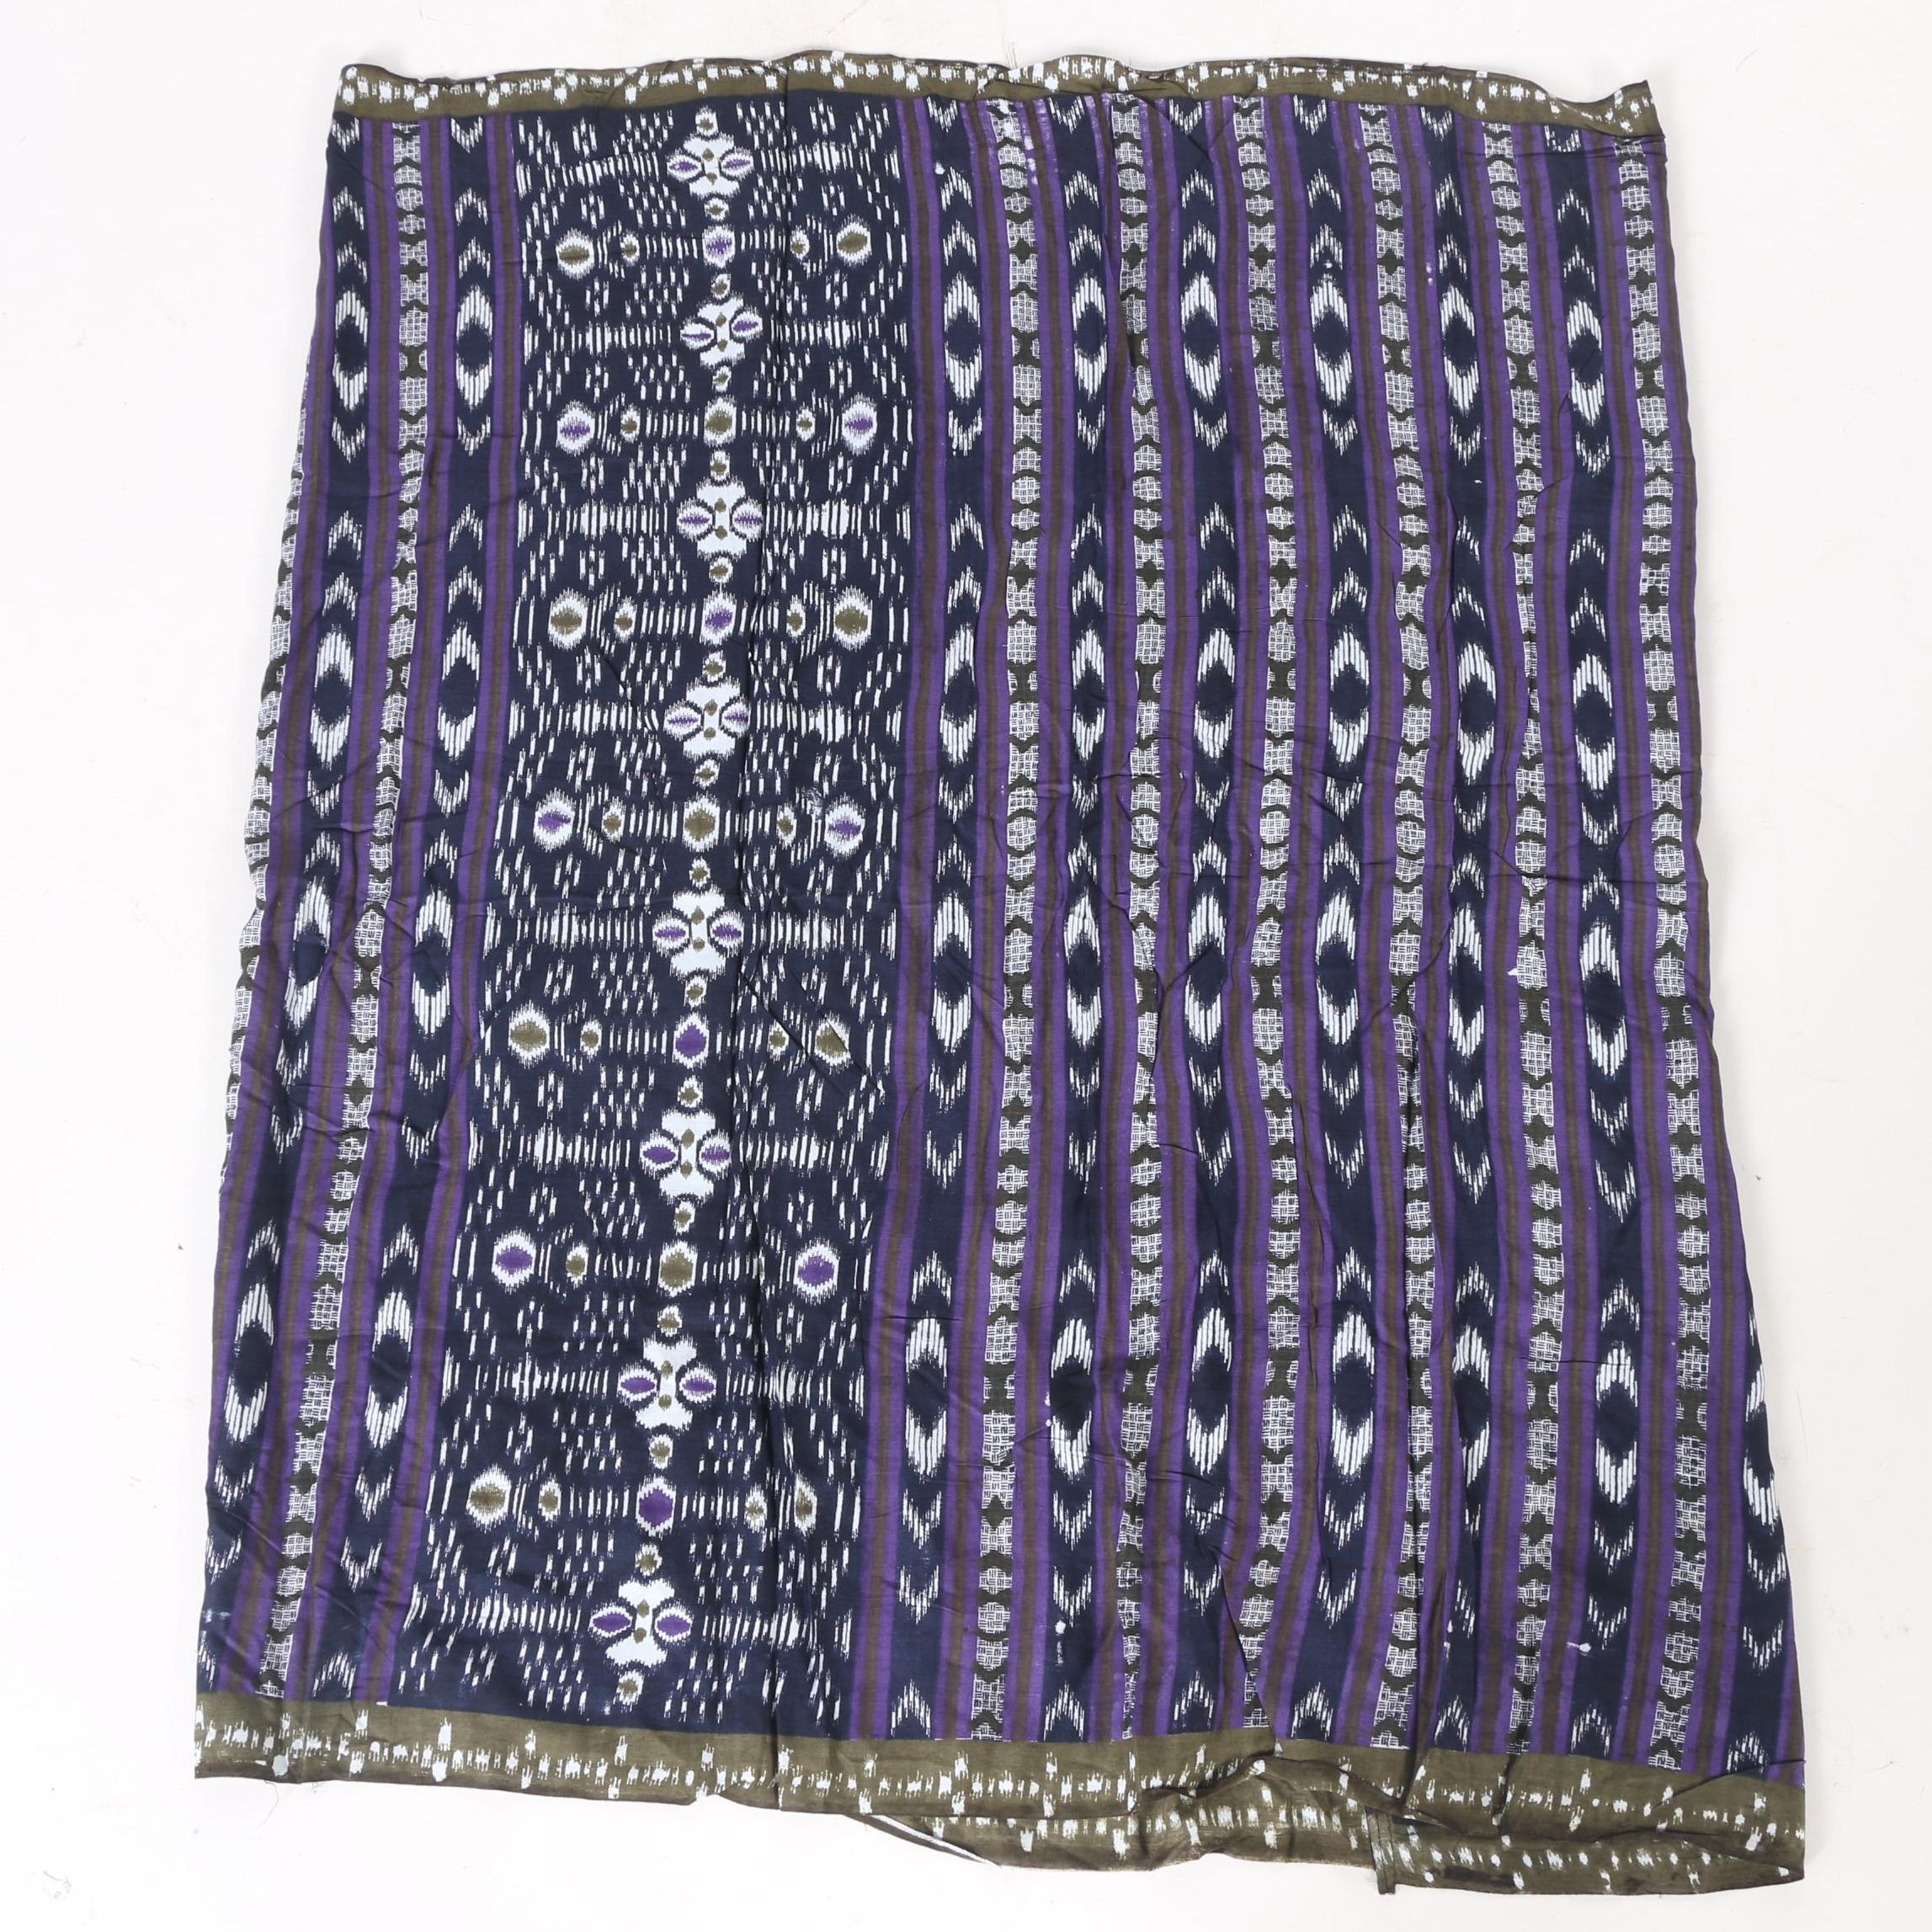 Batik Fabric Panel